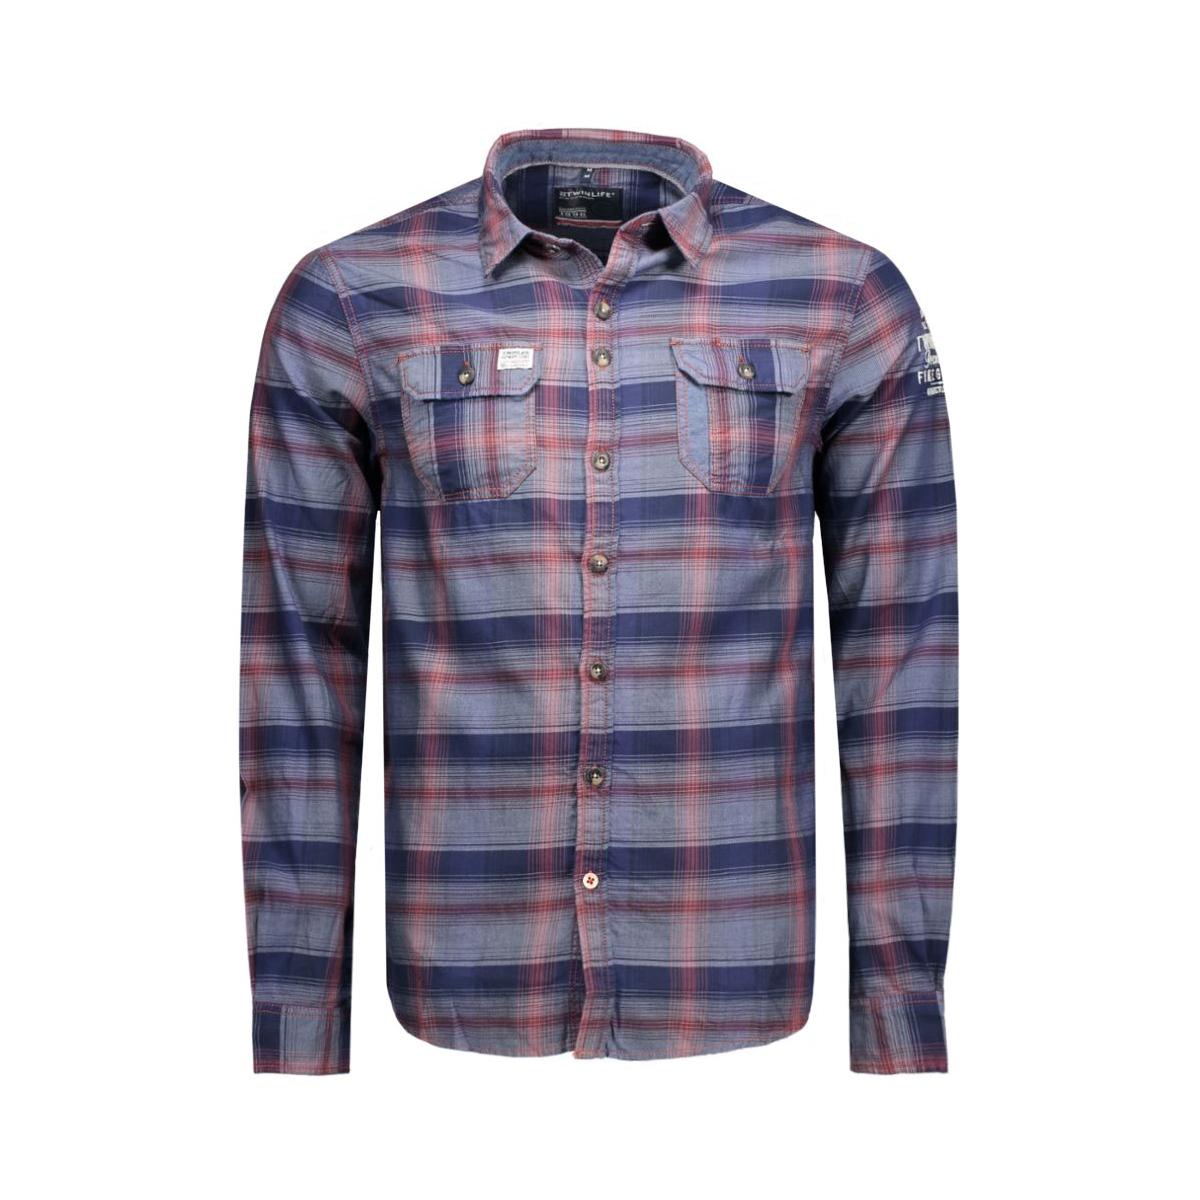 msh651615 twinlife overhemd 4499